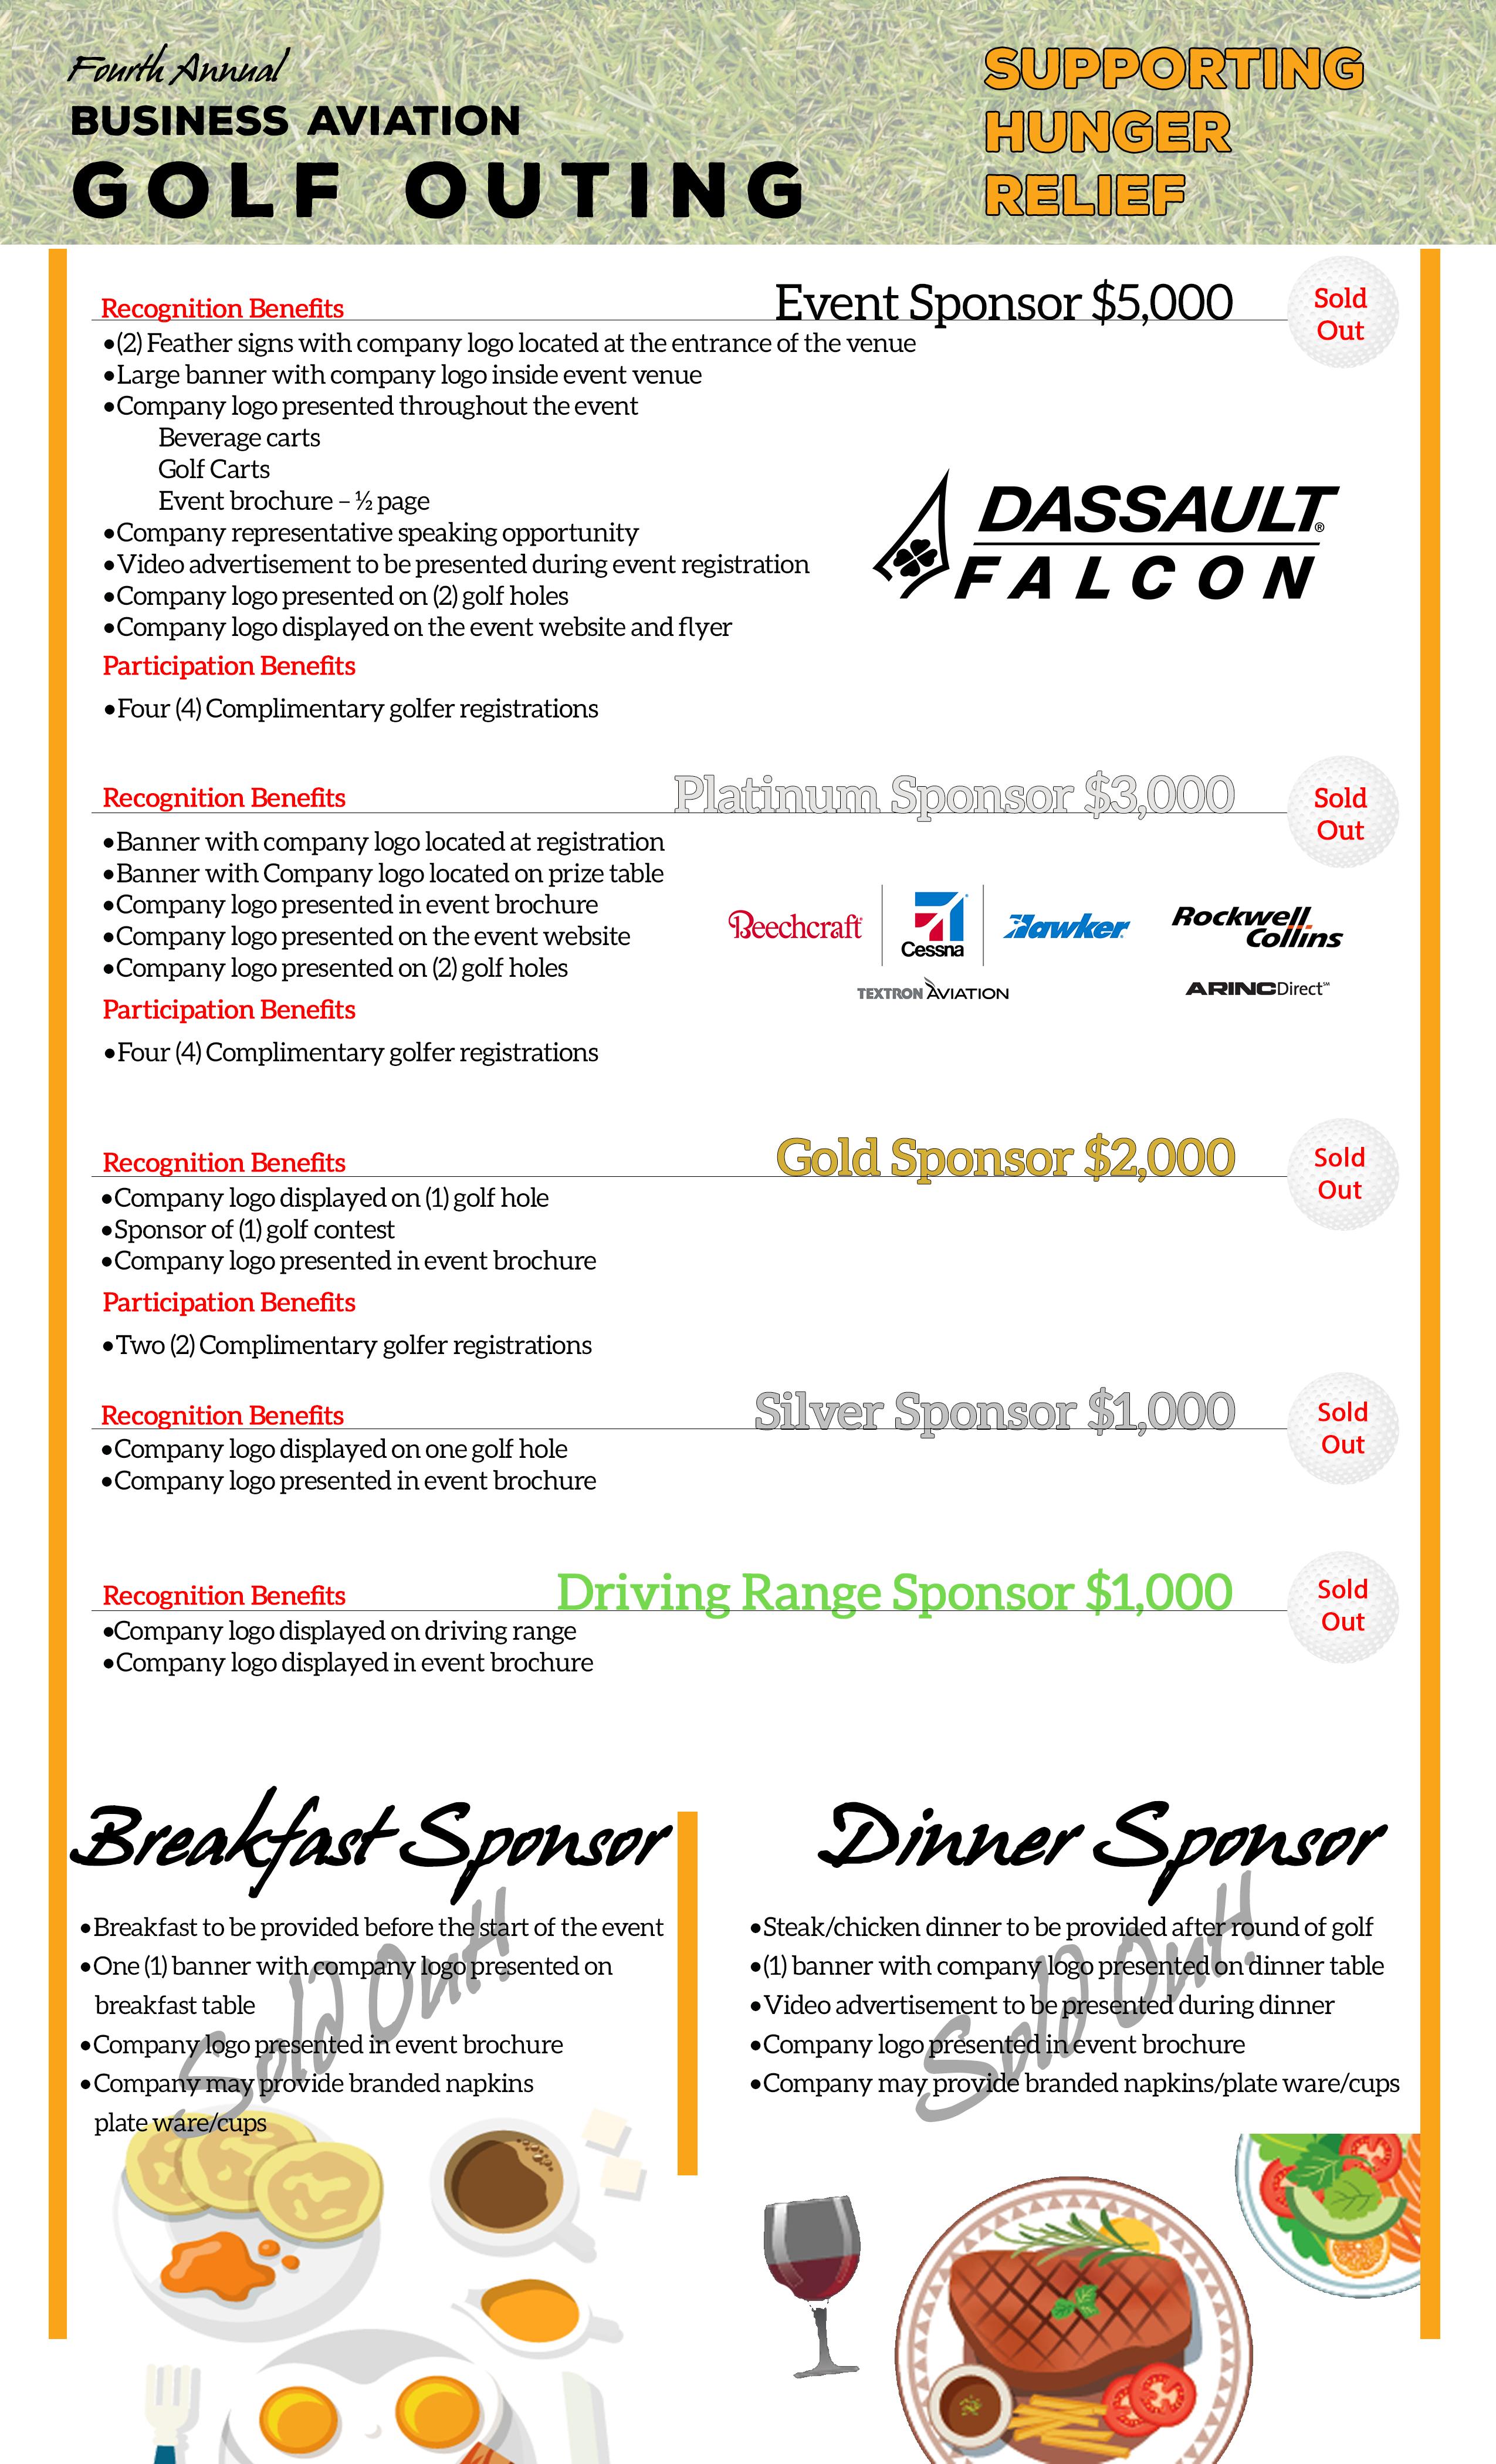 sponsorship-levels-05022017